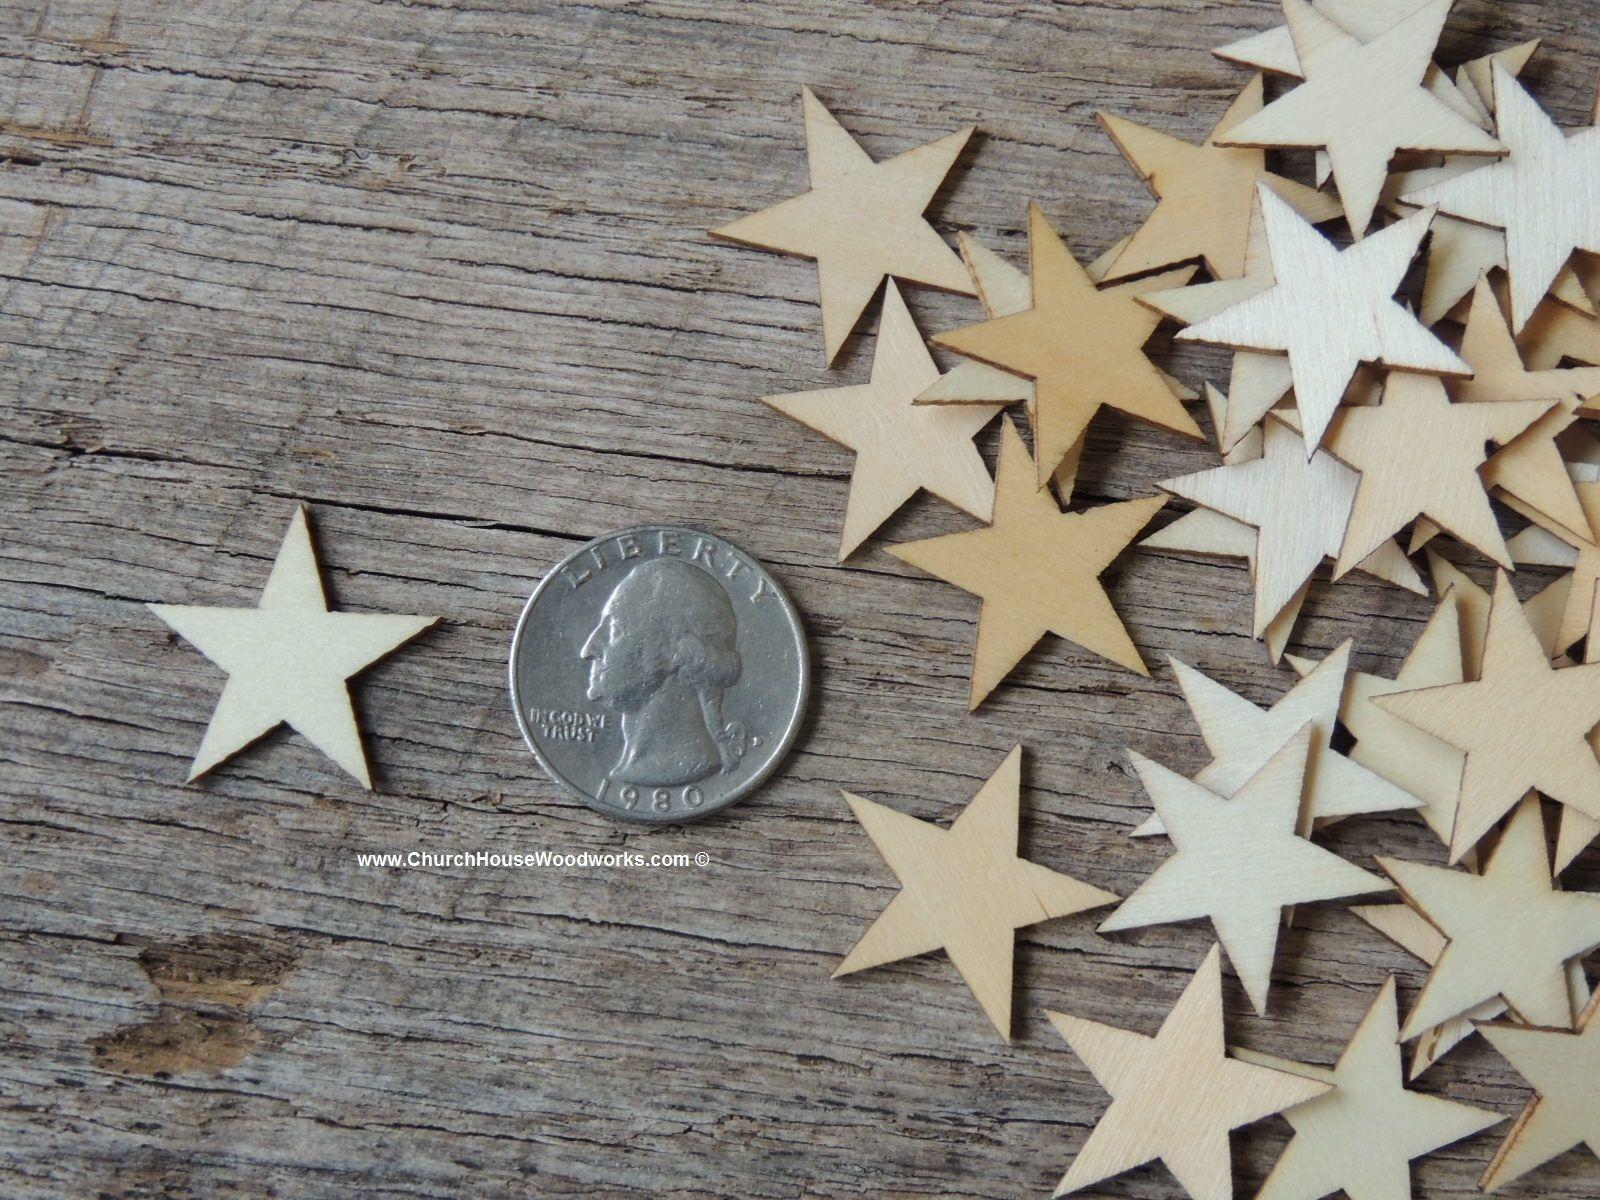 50 qty Small 1 inch Star Wood Embellishments Crafts Flag Woo